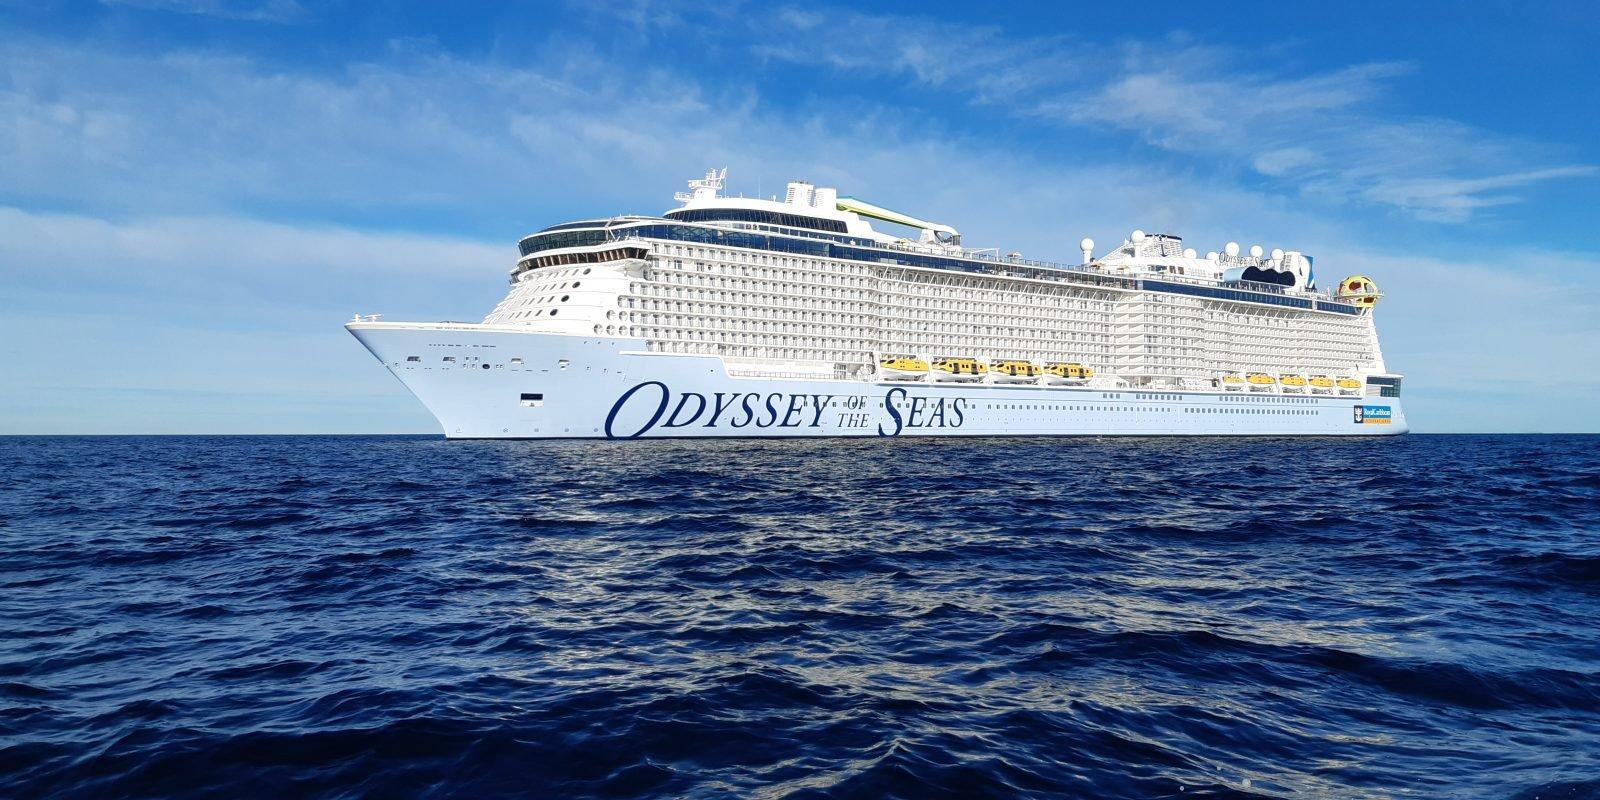 ODYSSEY-OF-THE-SEAS-0004